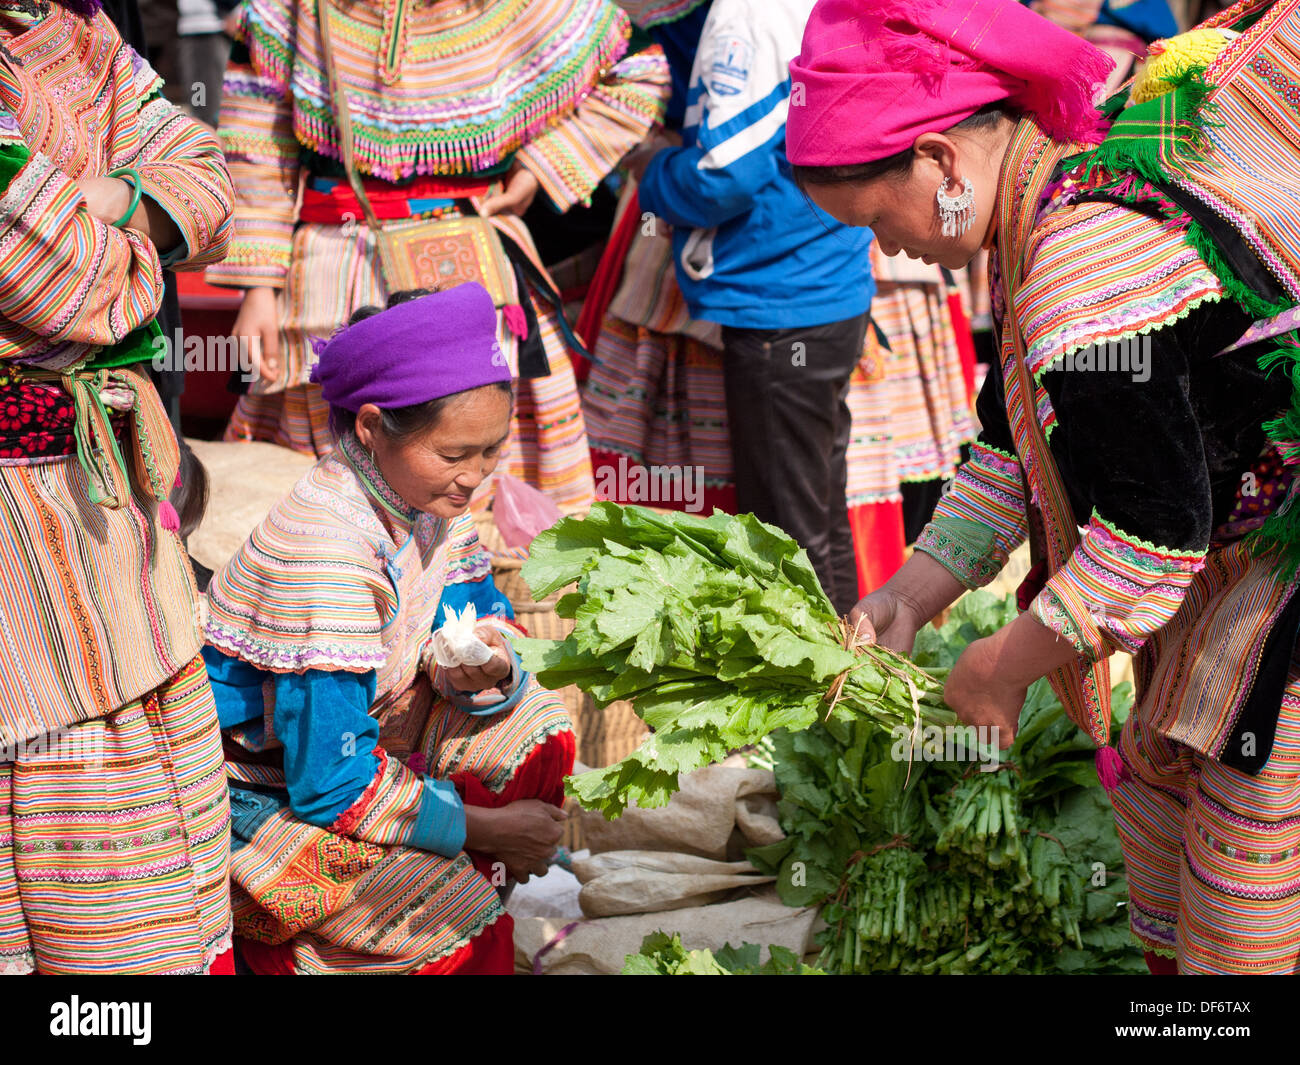 A Hmong woman buys vegetable greens at the Bac Ha Sunday morning market in Bac Ha, Lao Cai, Vietnam. - Stock Image